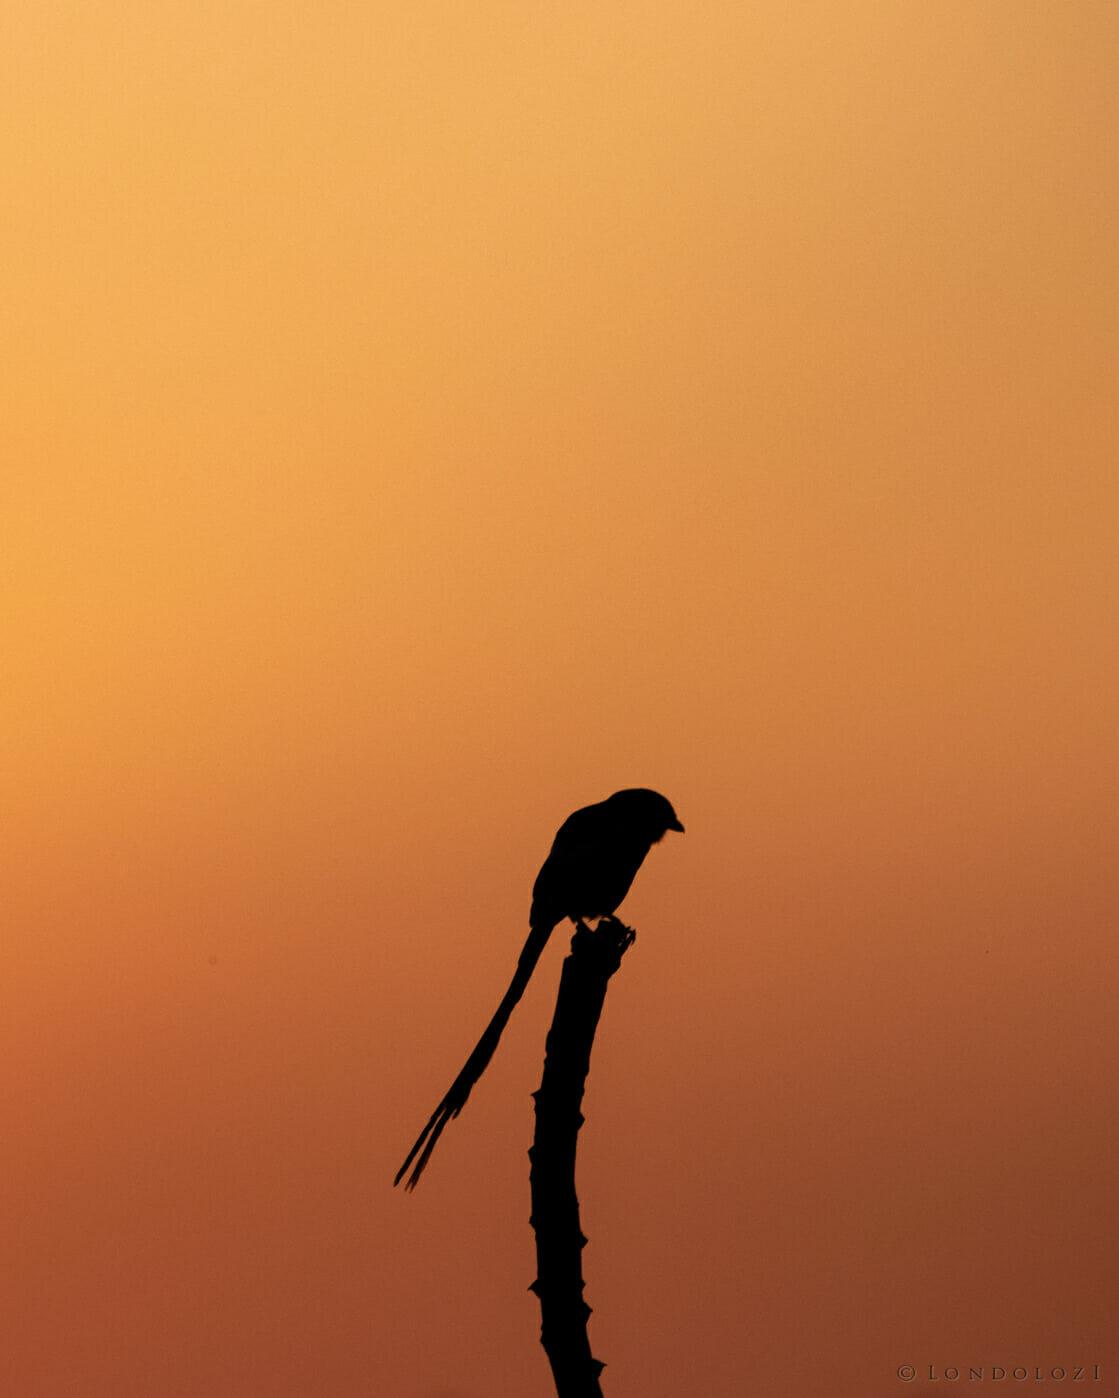 CT Magpie Shrike Silhouette Sunset, June 2021